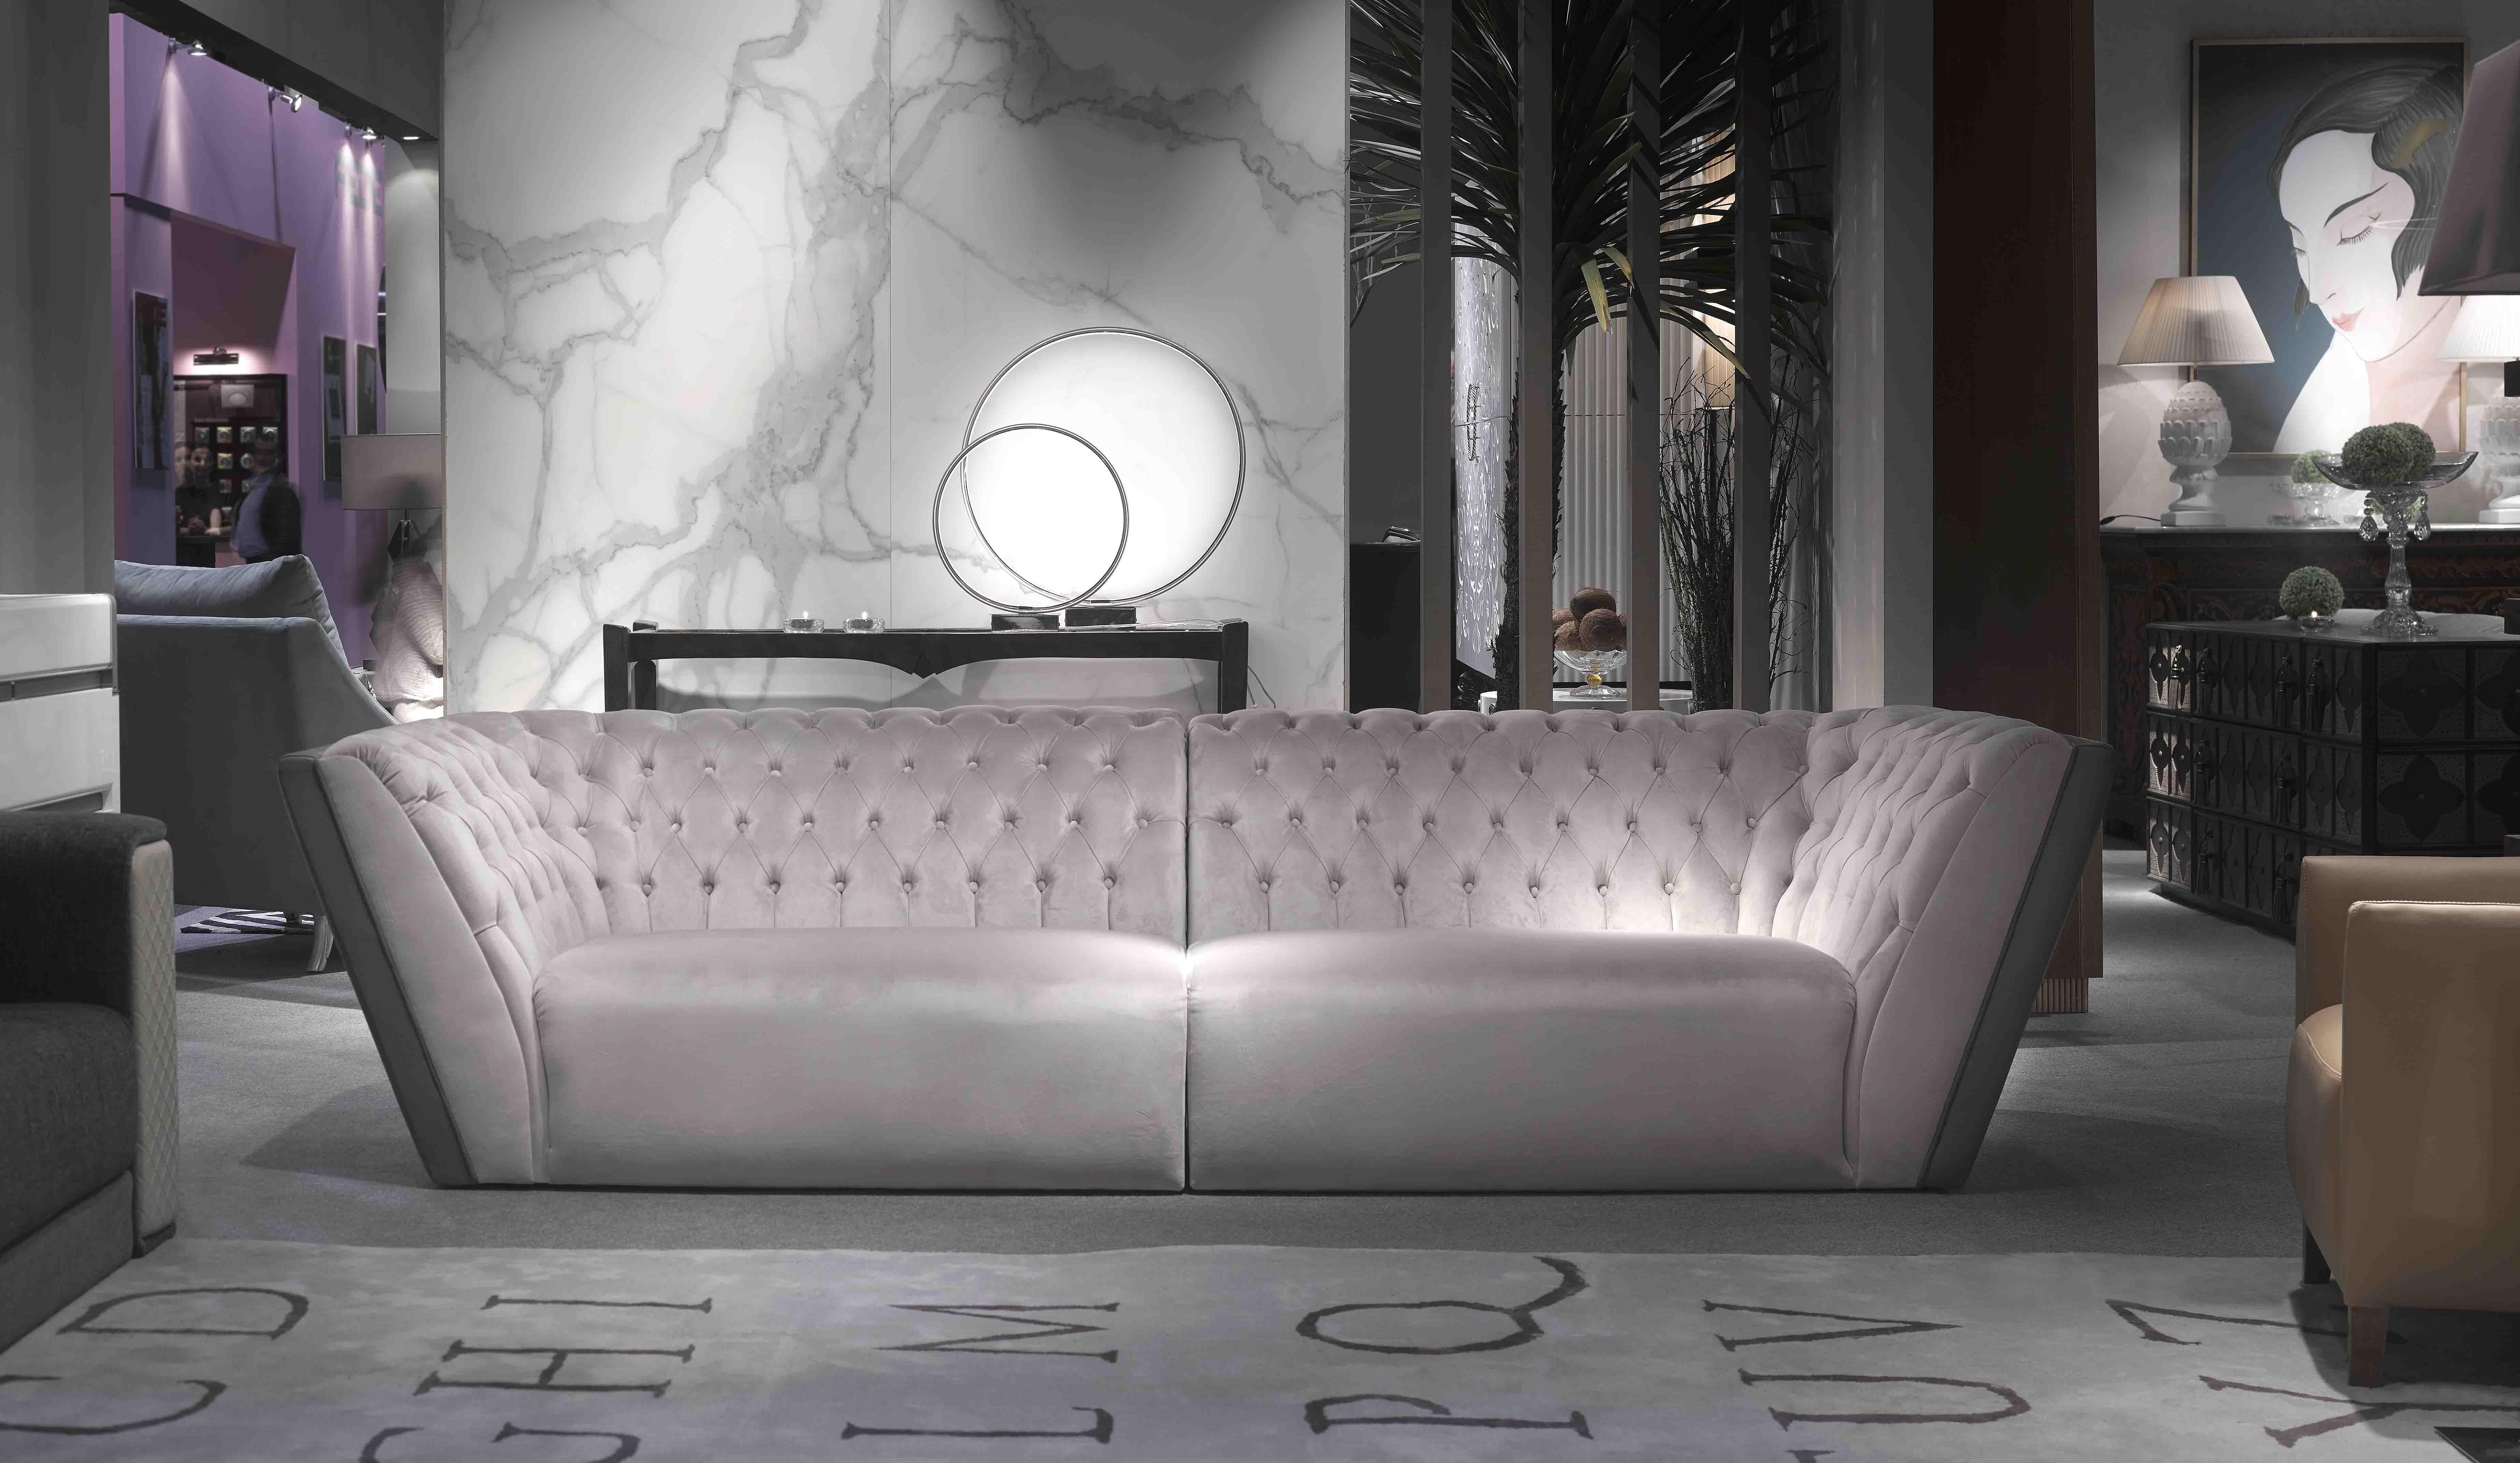 Luxury modern sectional sofas | Hawk Haven